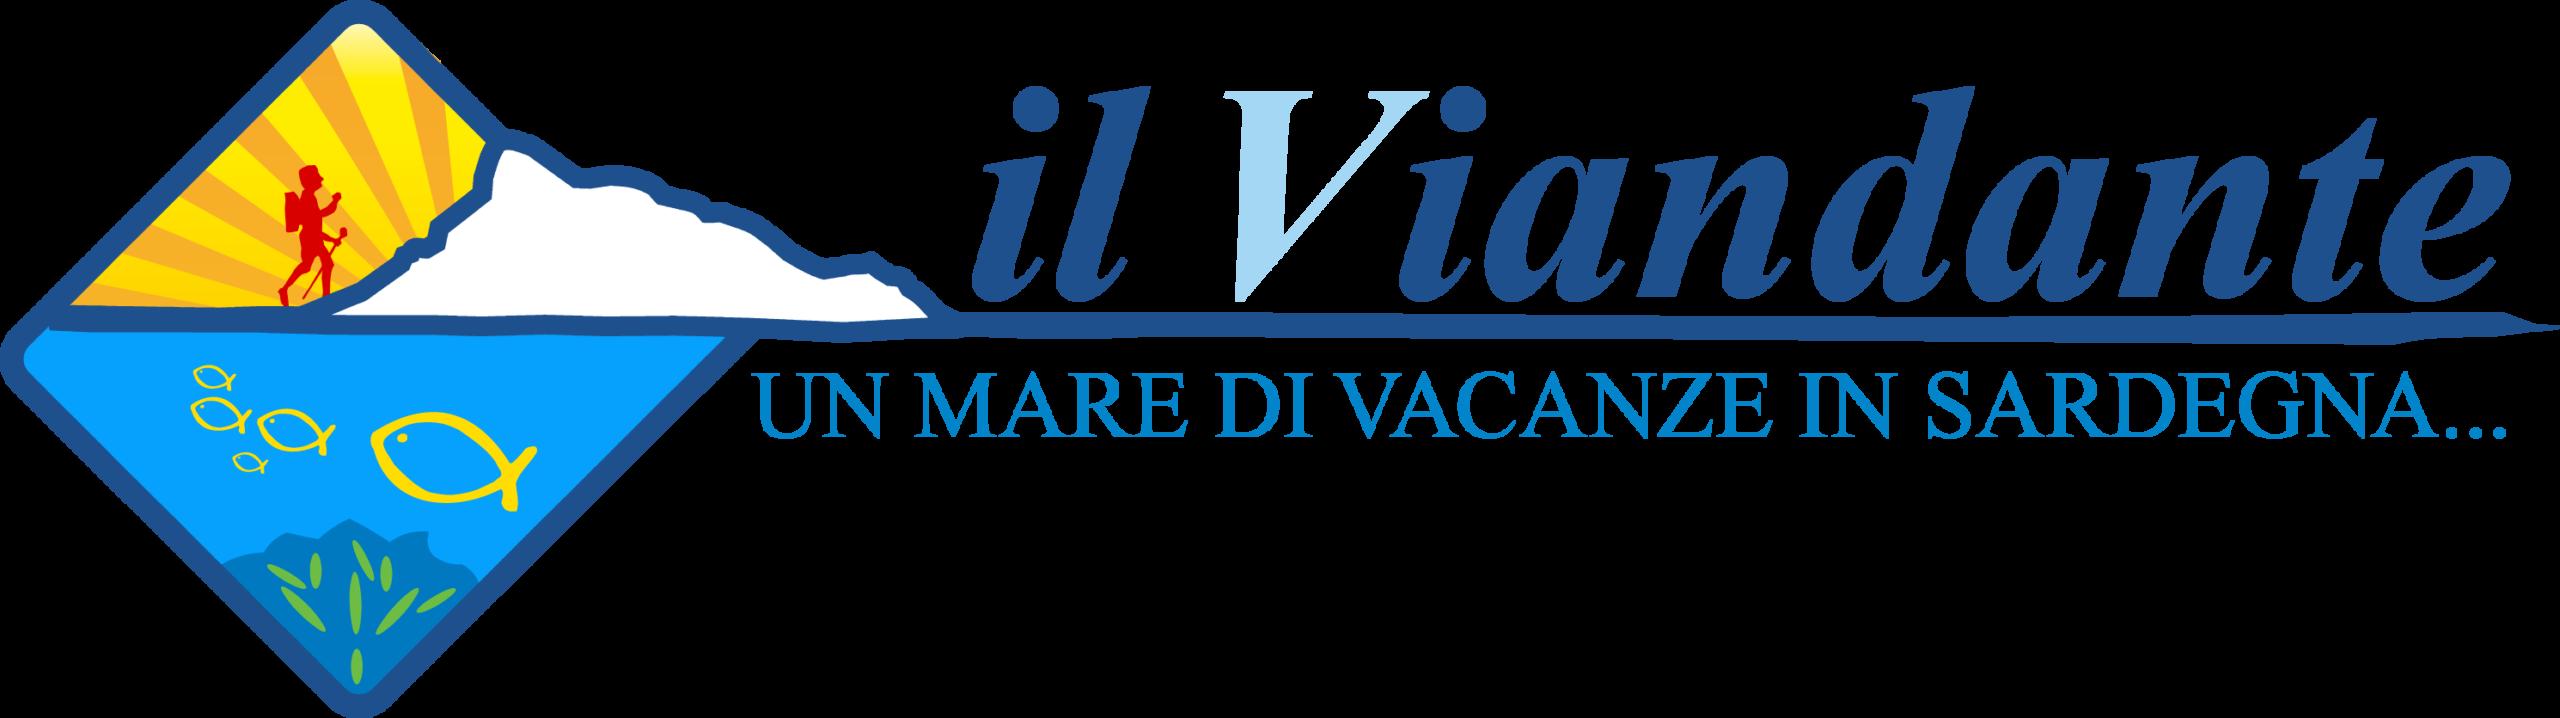 Hotel Il Viandante in San Teodoro: B&B auf Sardinien